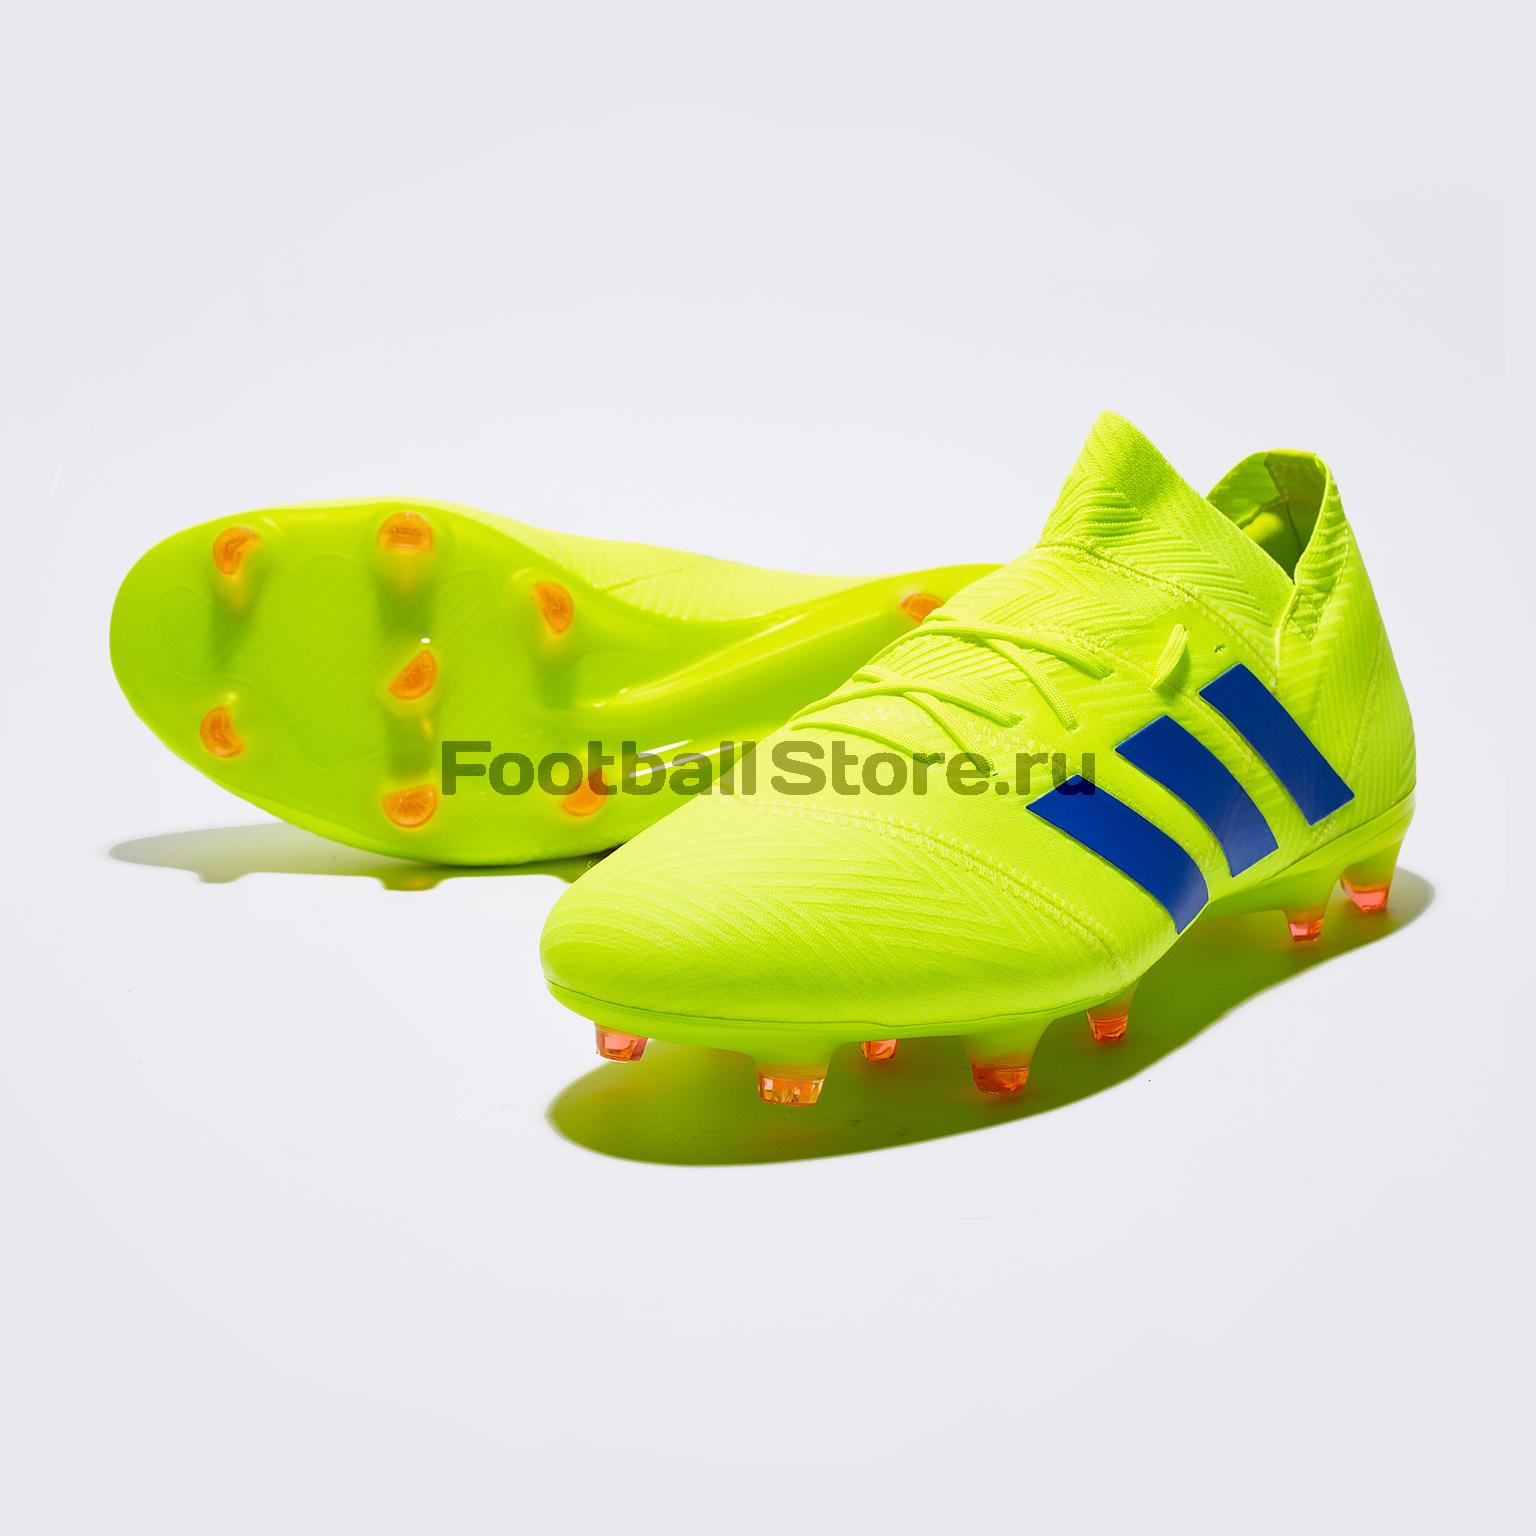 Бутсы Adidas Nemeziz 18.1 FG BB9426 бутсы adidas nemeziz messi 17 1 fg cp9028